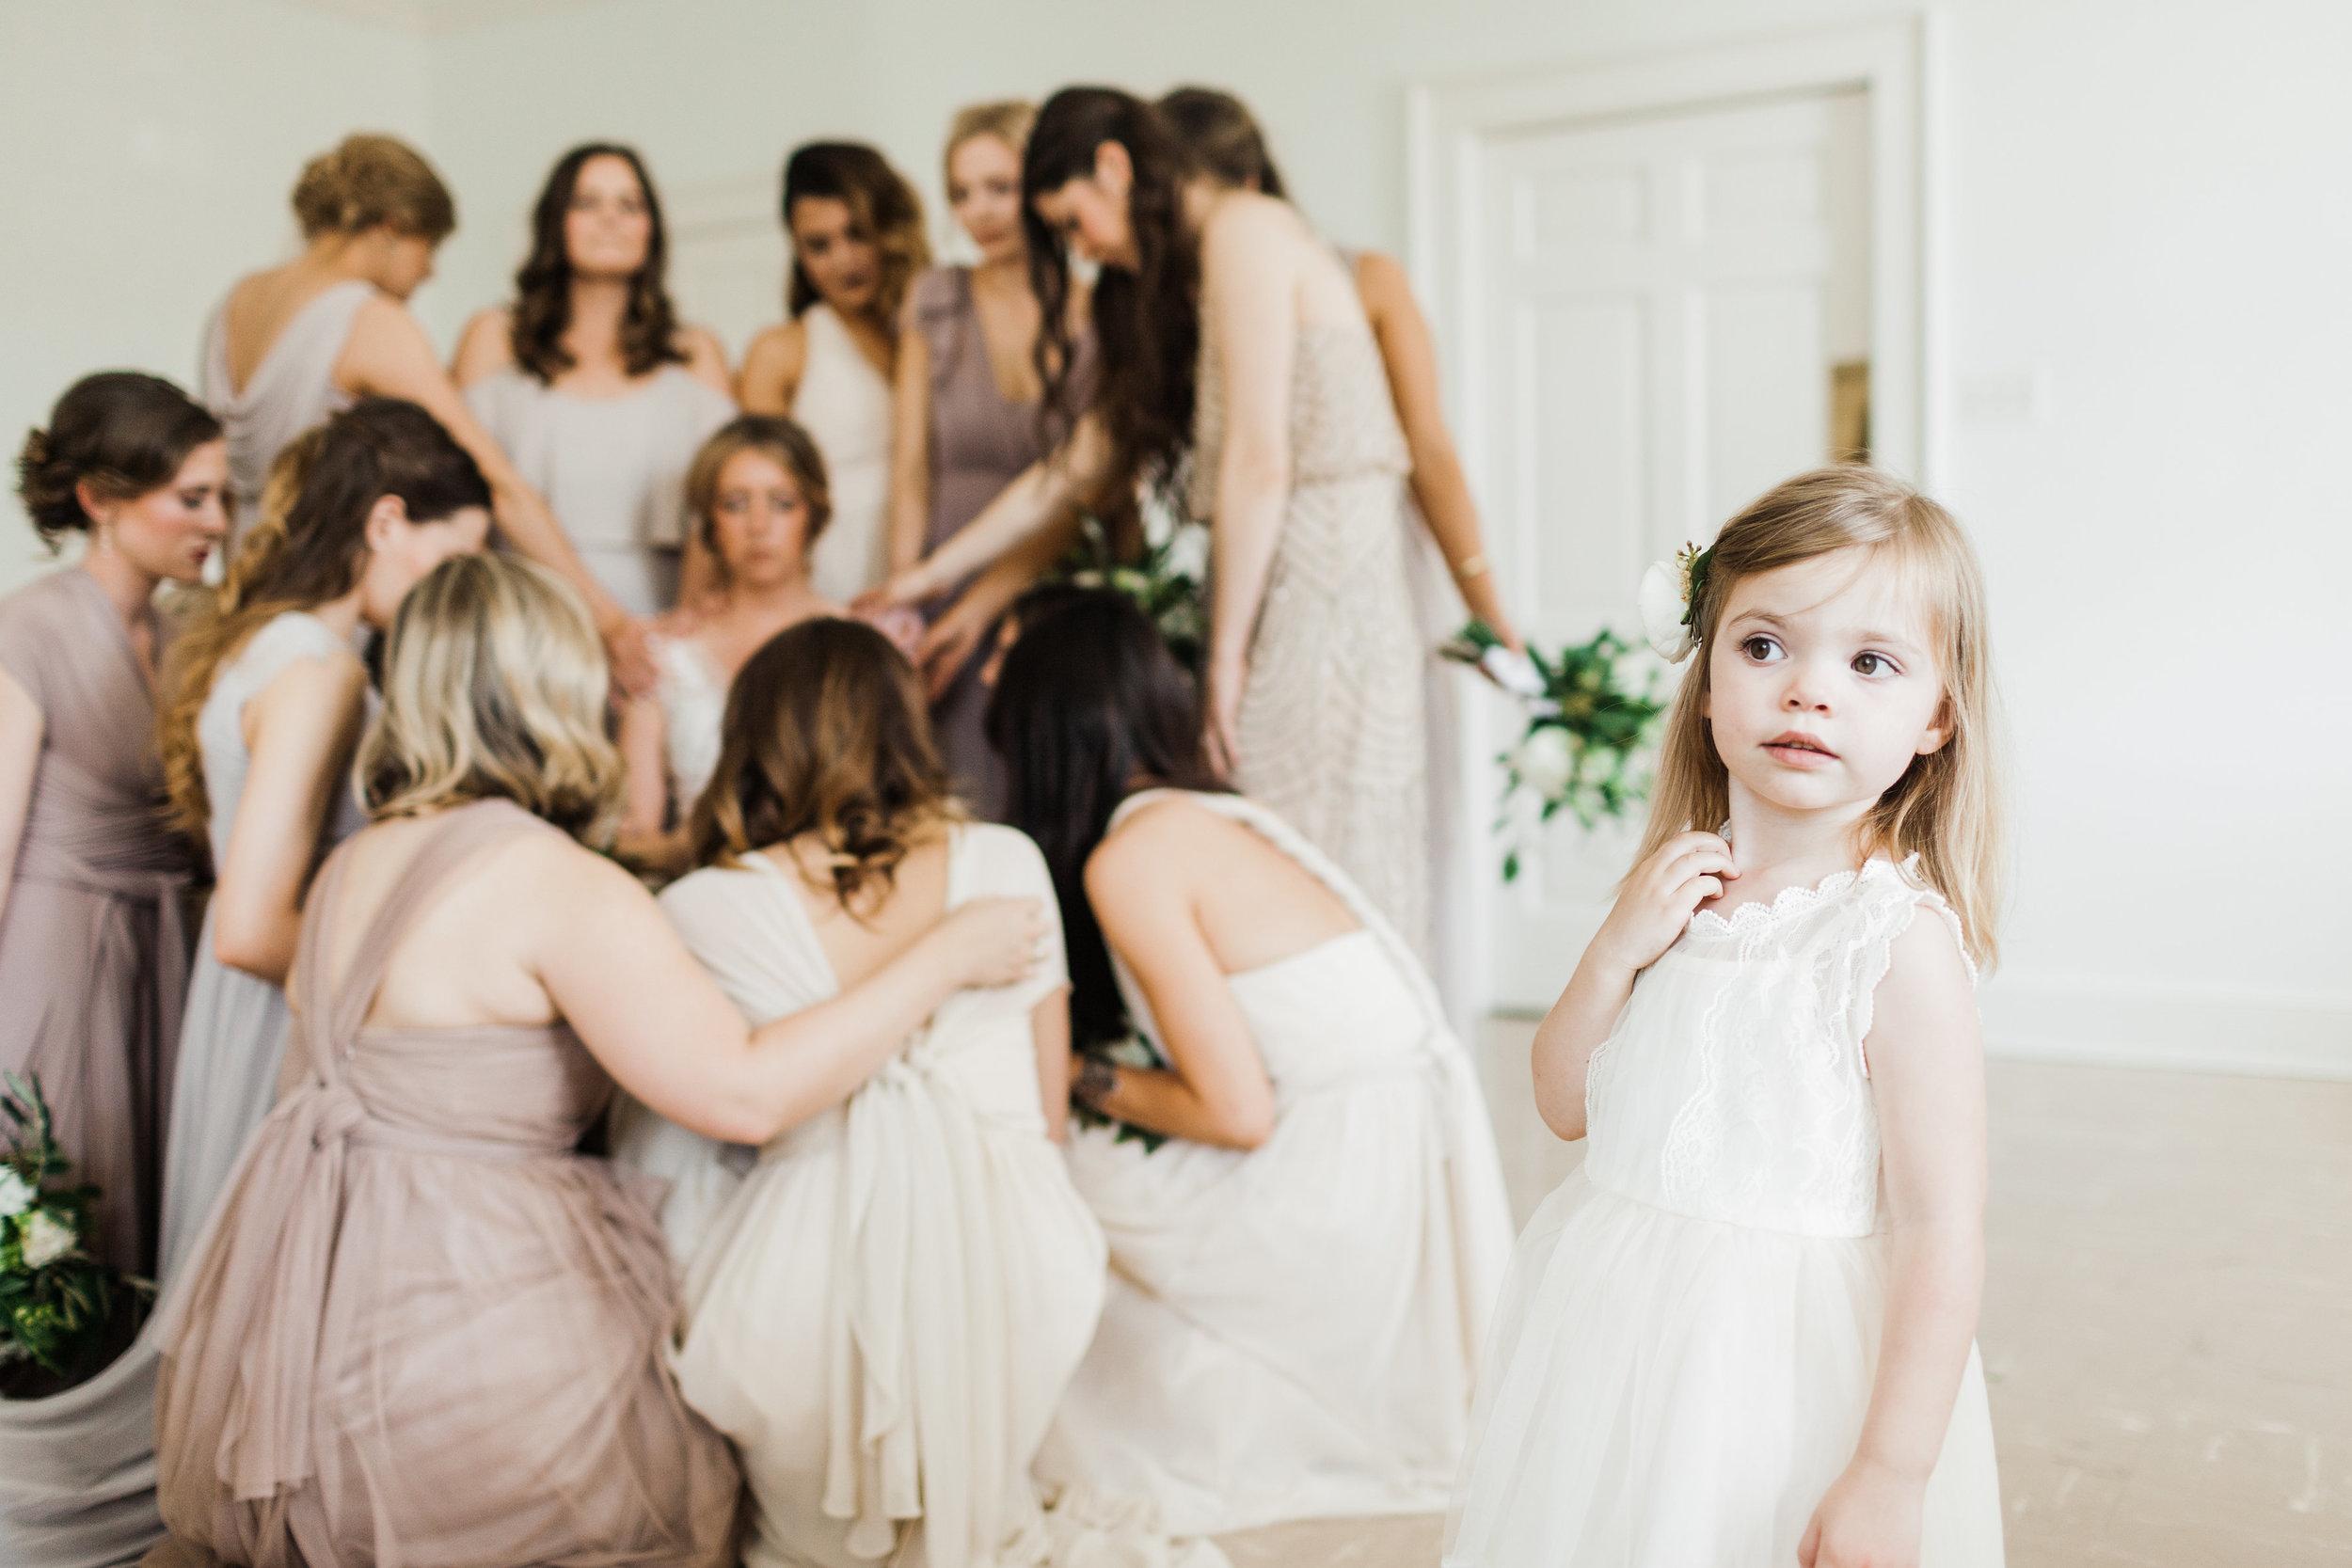 Southern Fete, Southern Wedding, Flower girl, Bridal Party, Carolynn Seibert Photography